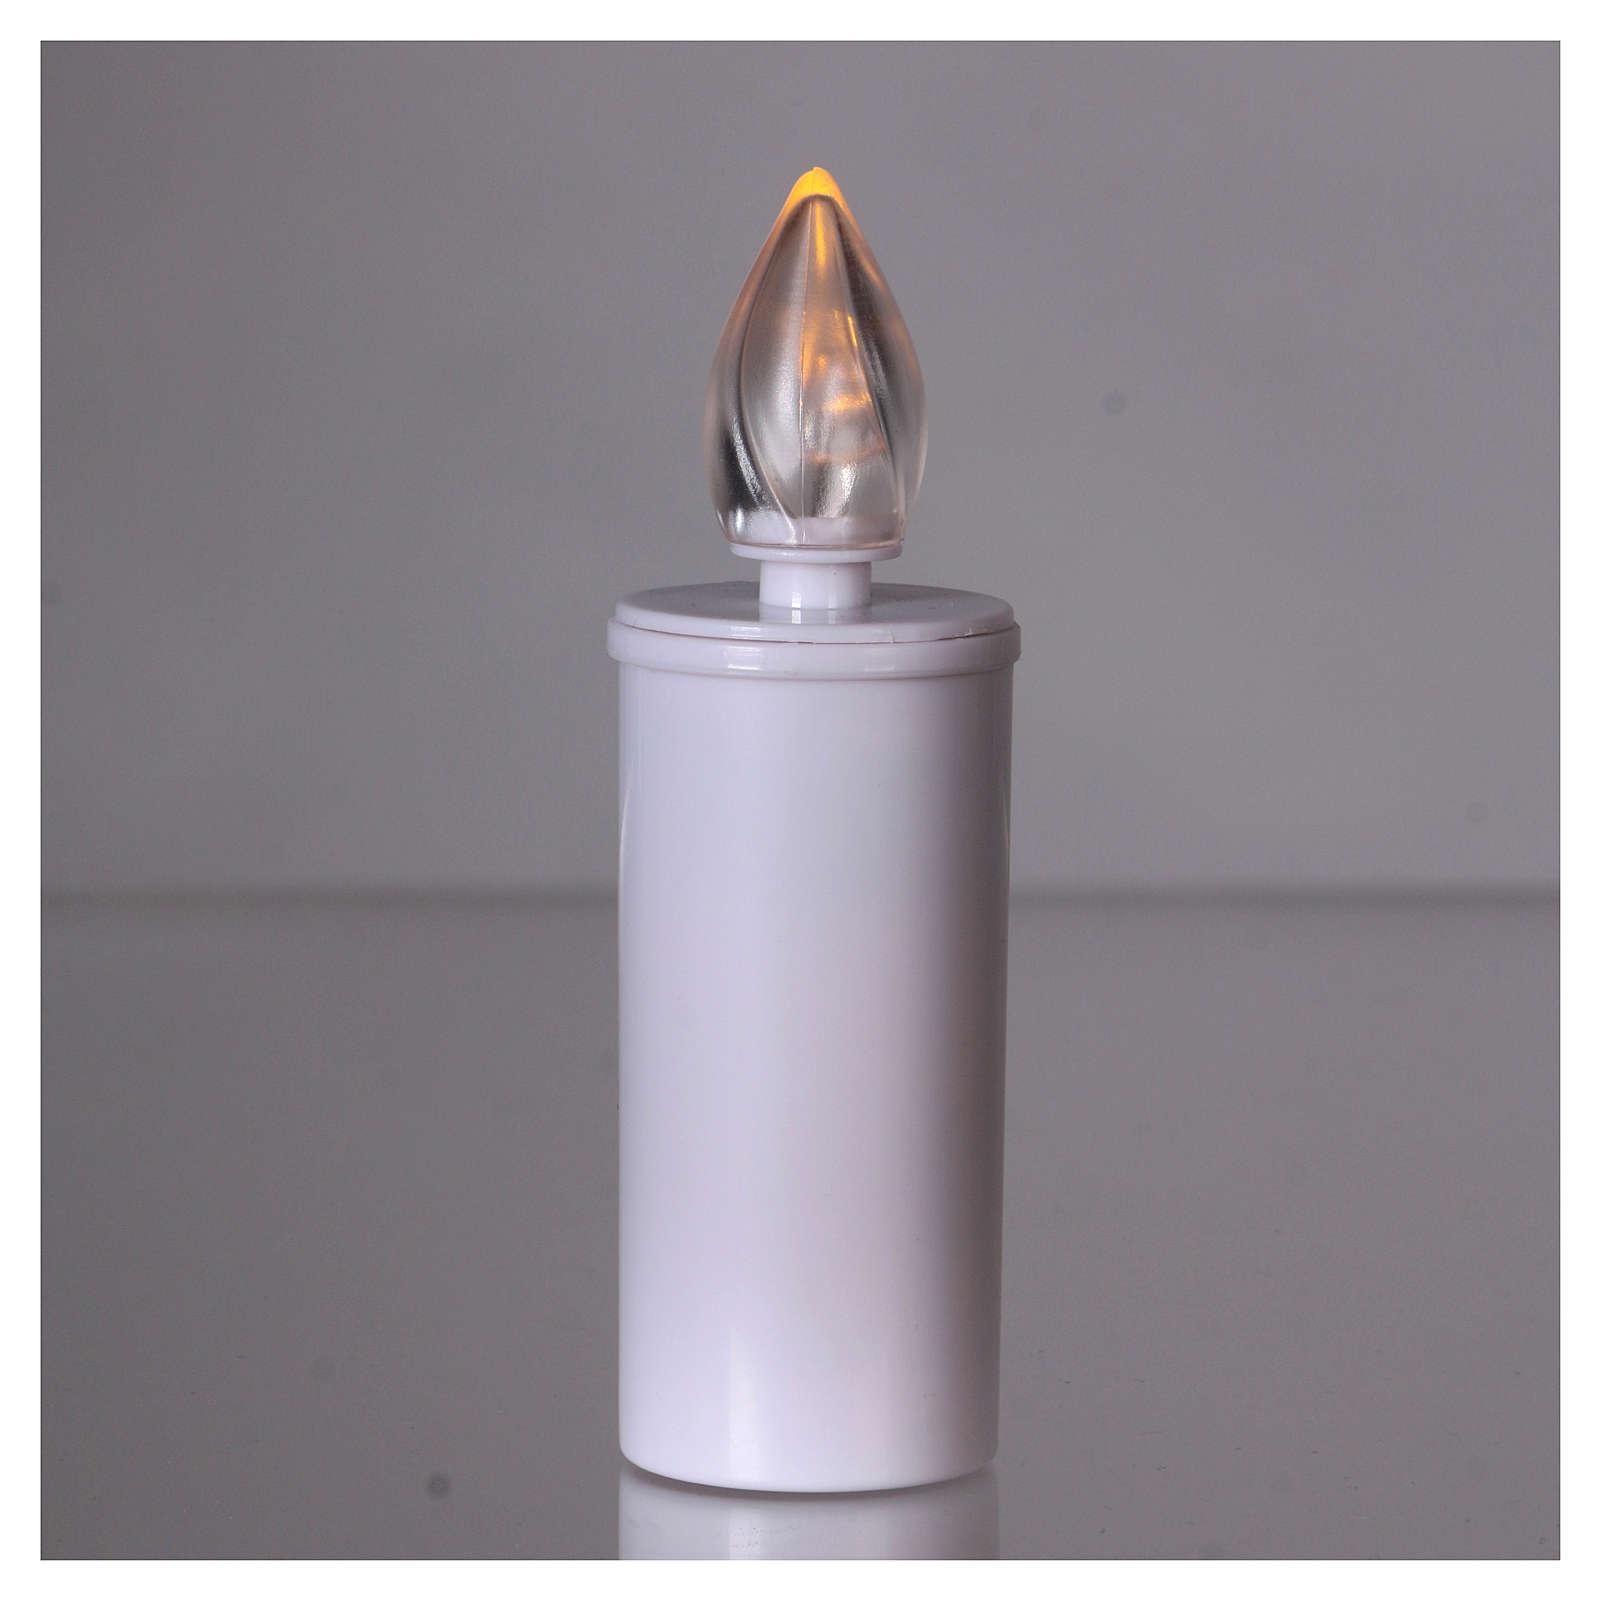 Lamparilla Lumada desechable anual luz parpadeante amarilla 3